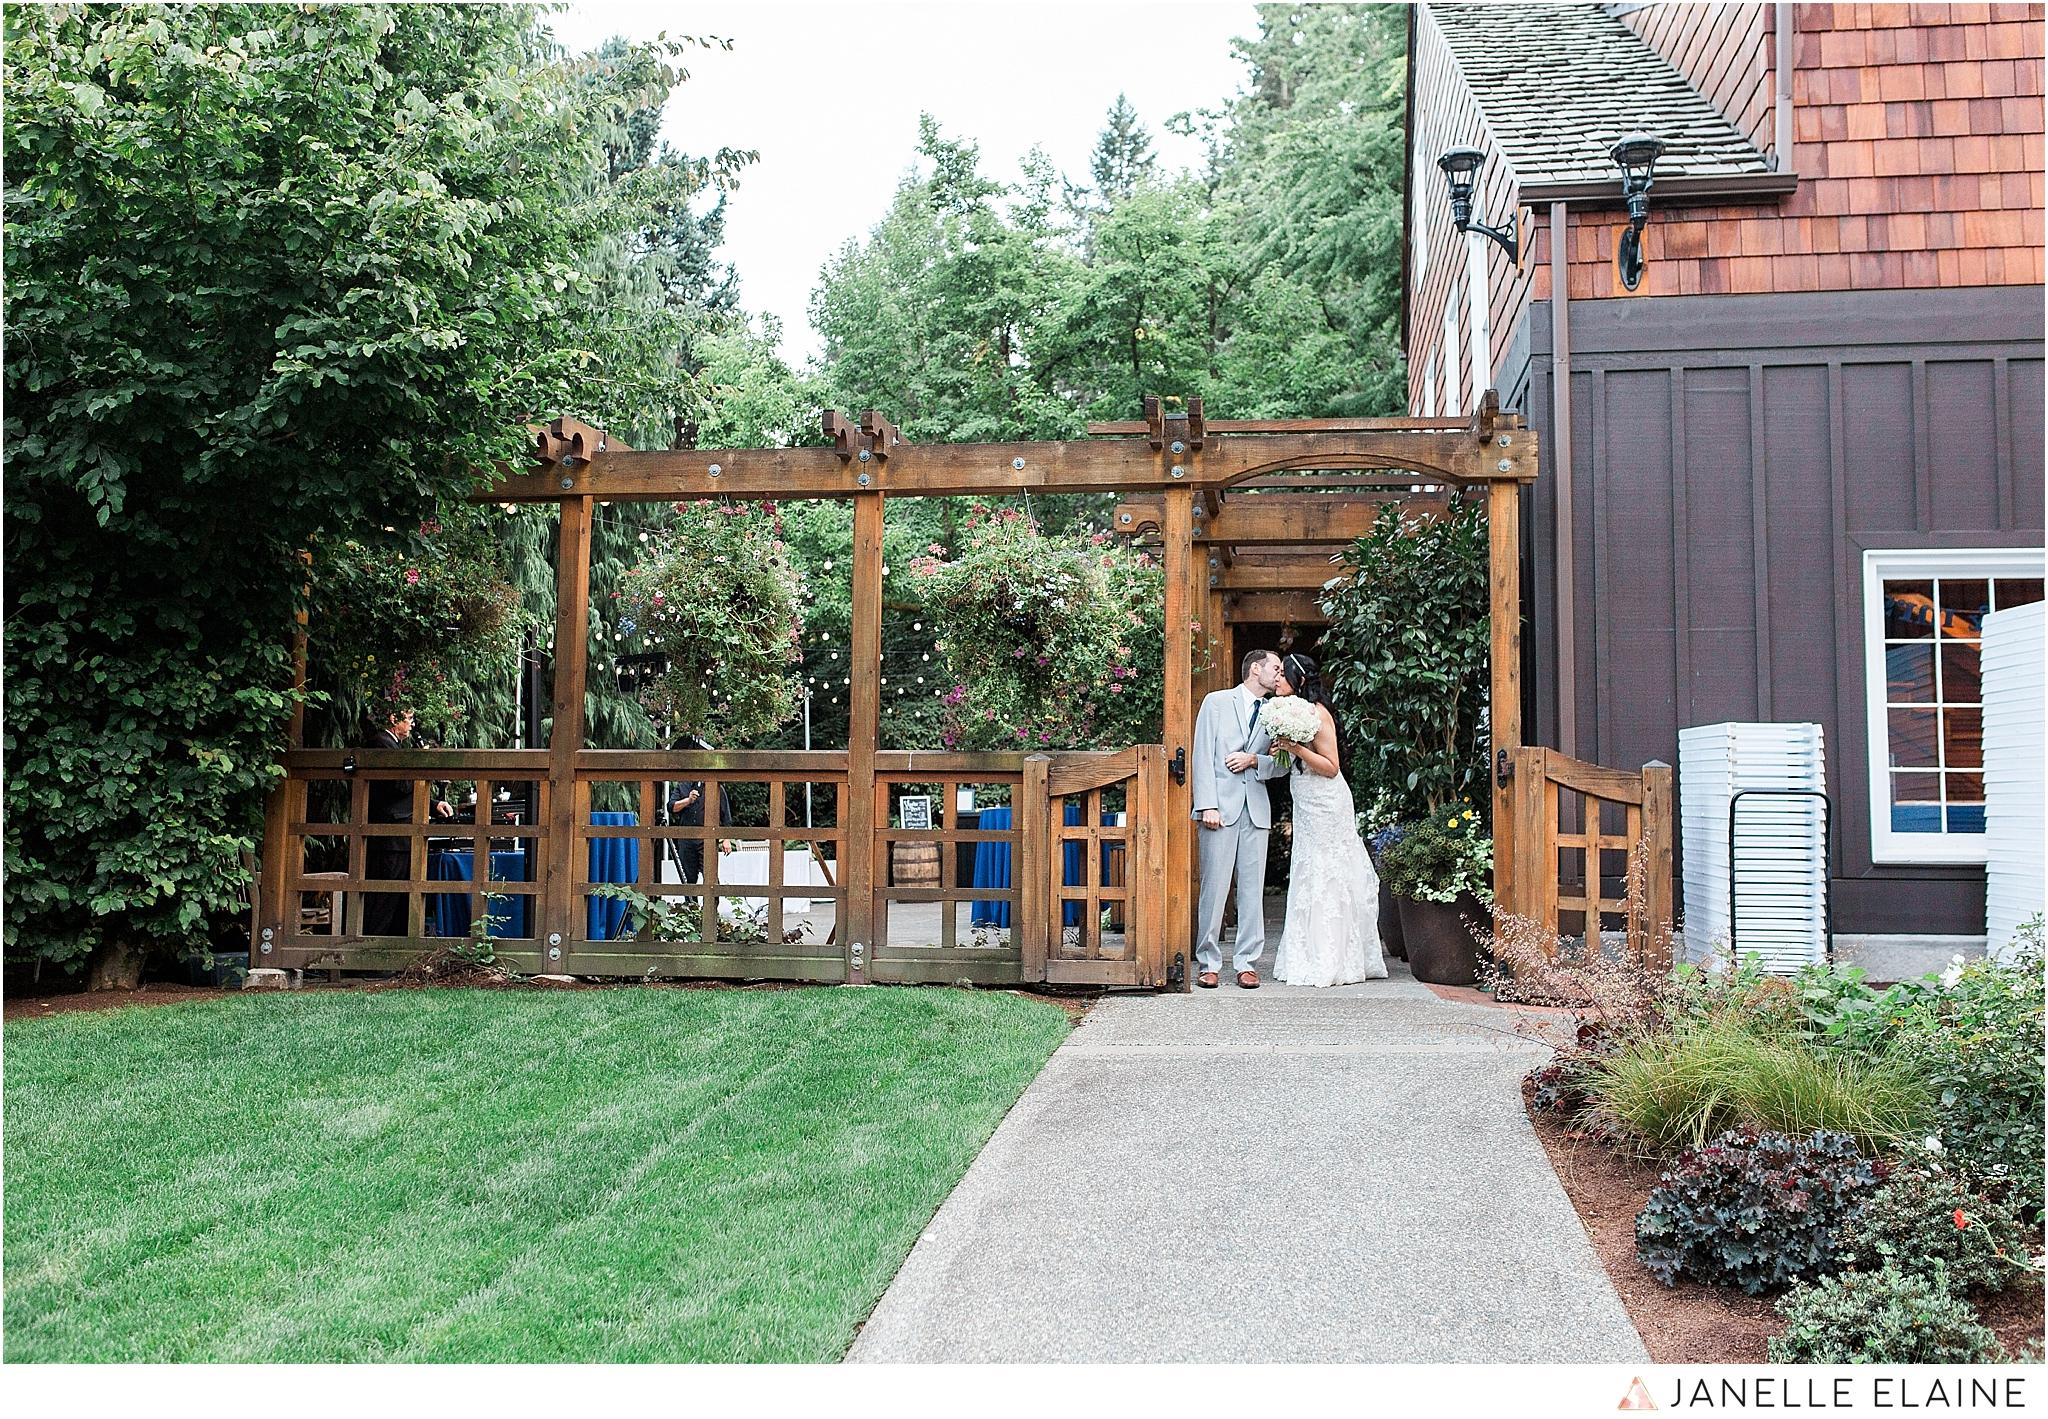 janelle elaine photography-professional wedding photographer-seattle-bellevue-robinswood house-252.jpg